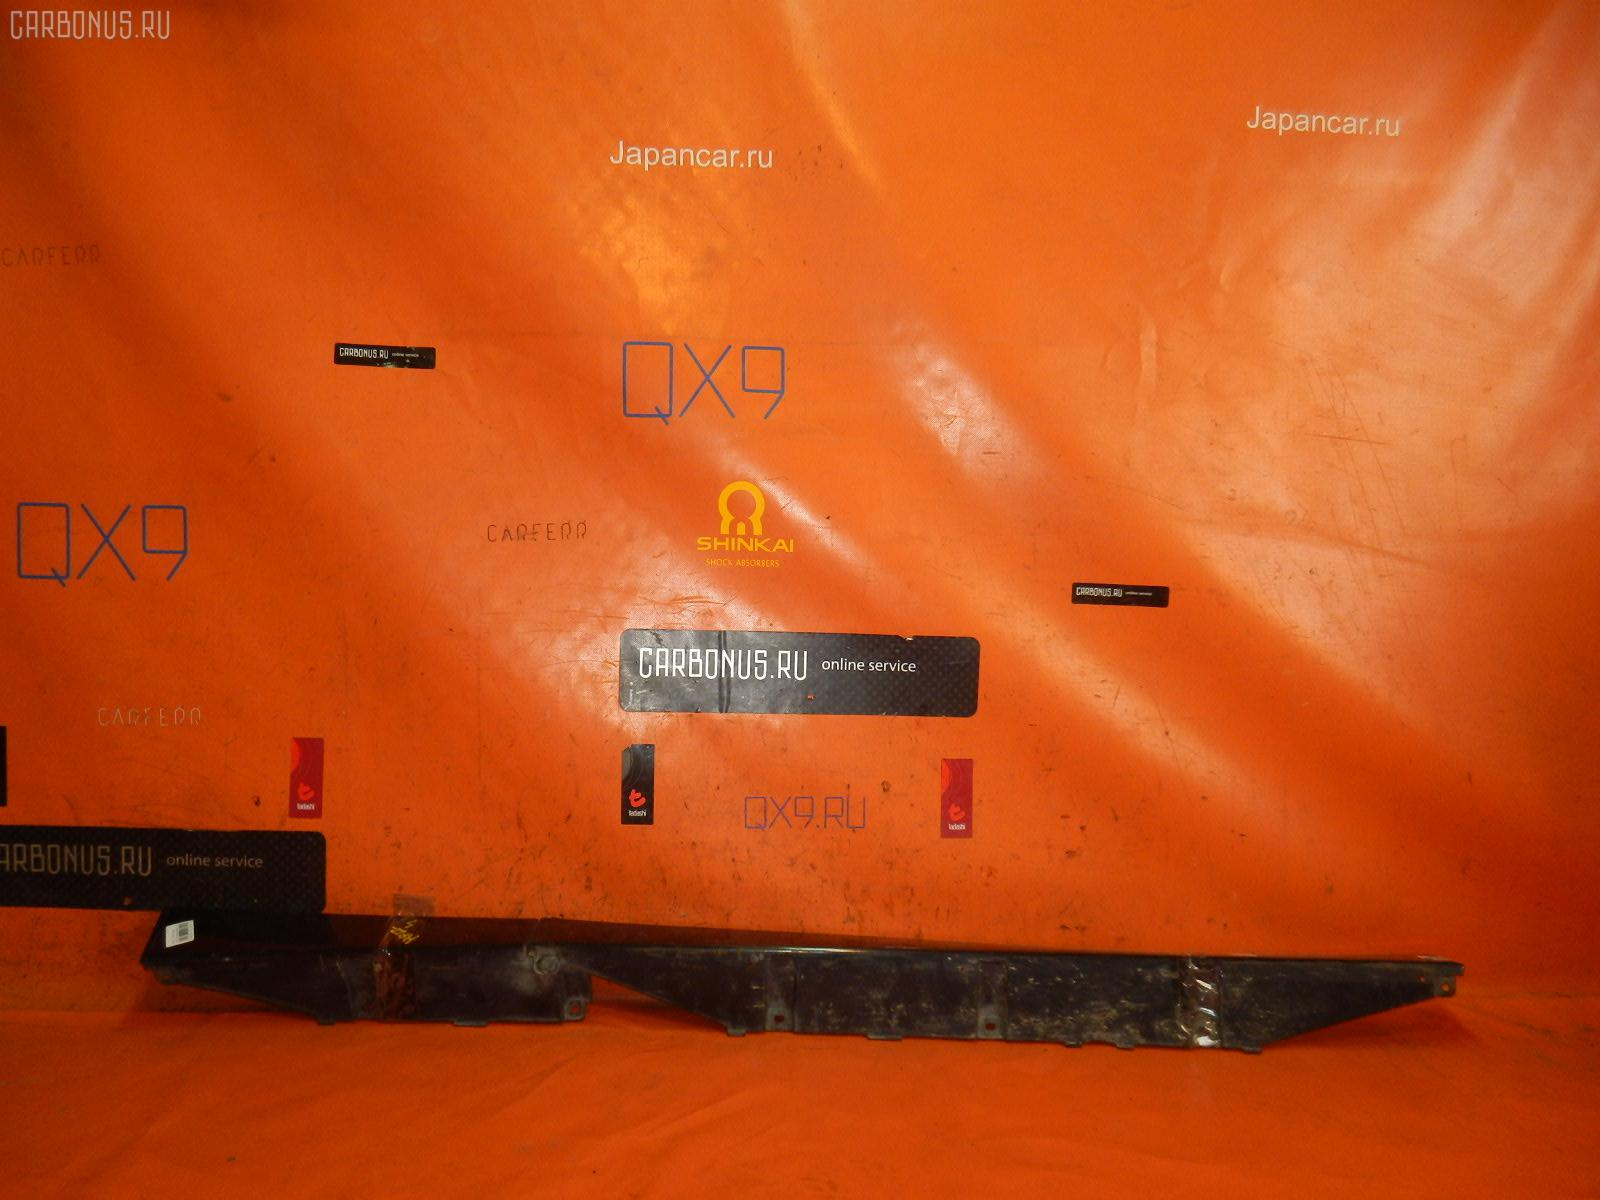 Порог кузова пластиковый ( обвес ) MAZDA LAPUTA HP22S Фото 2